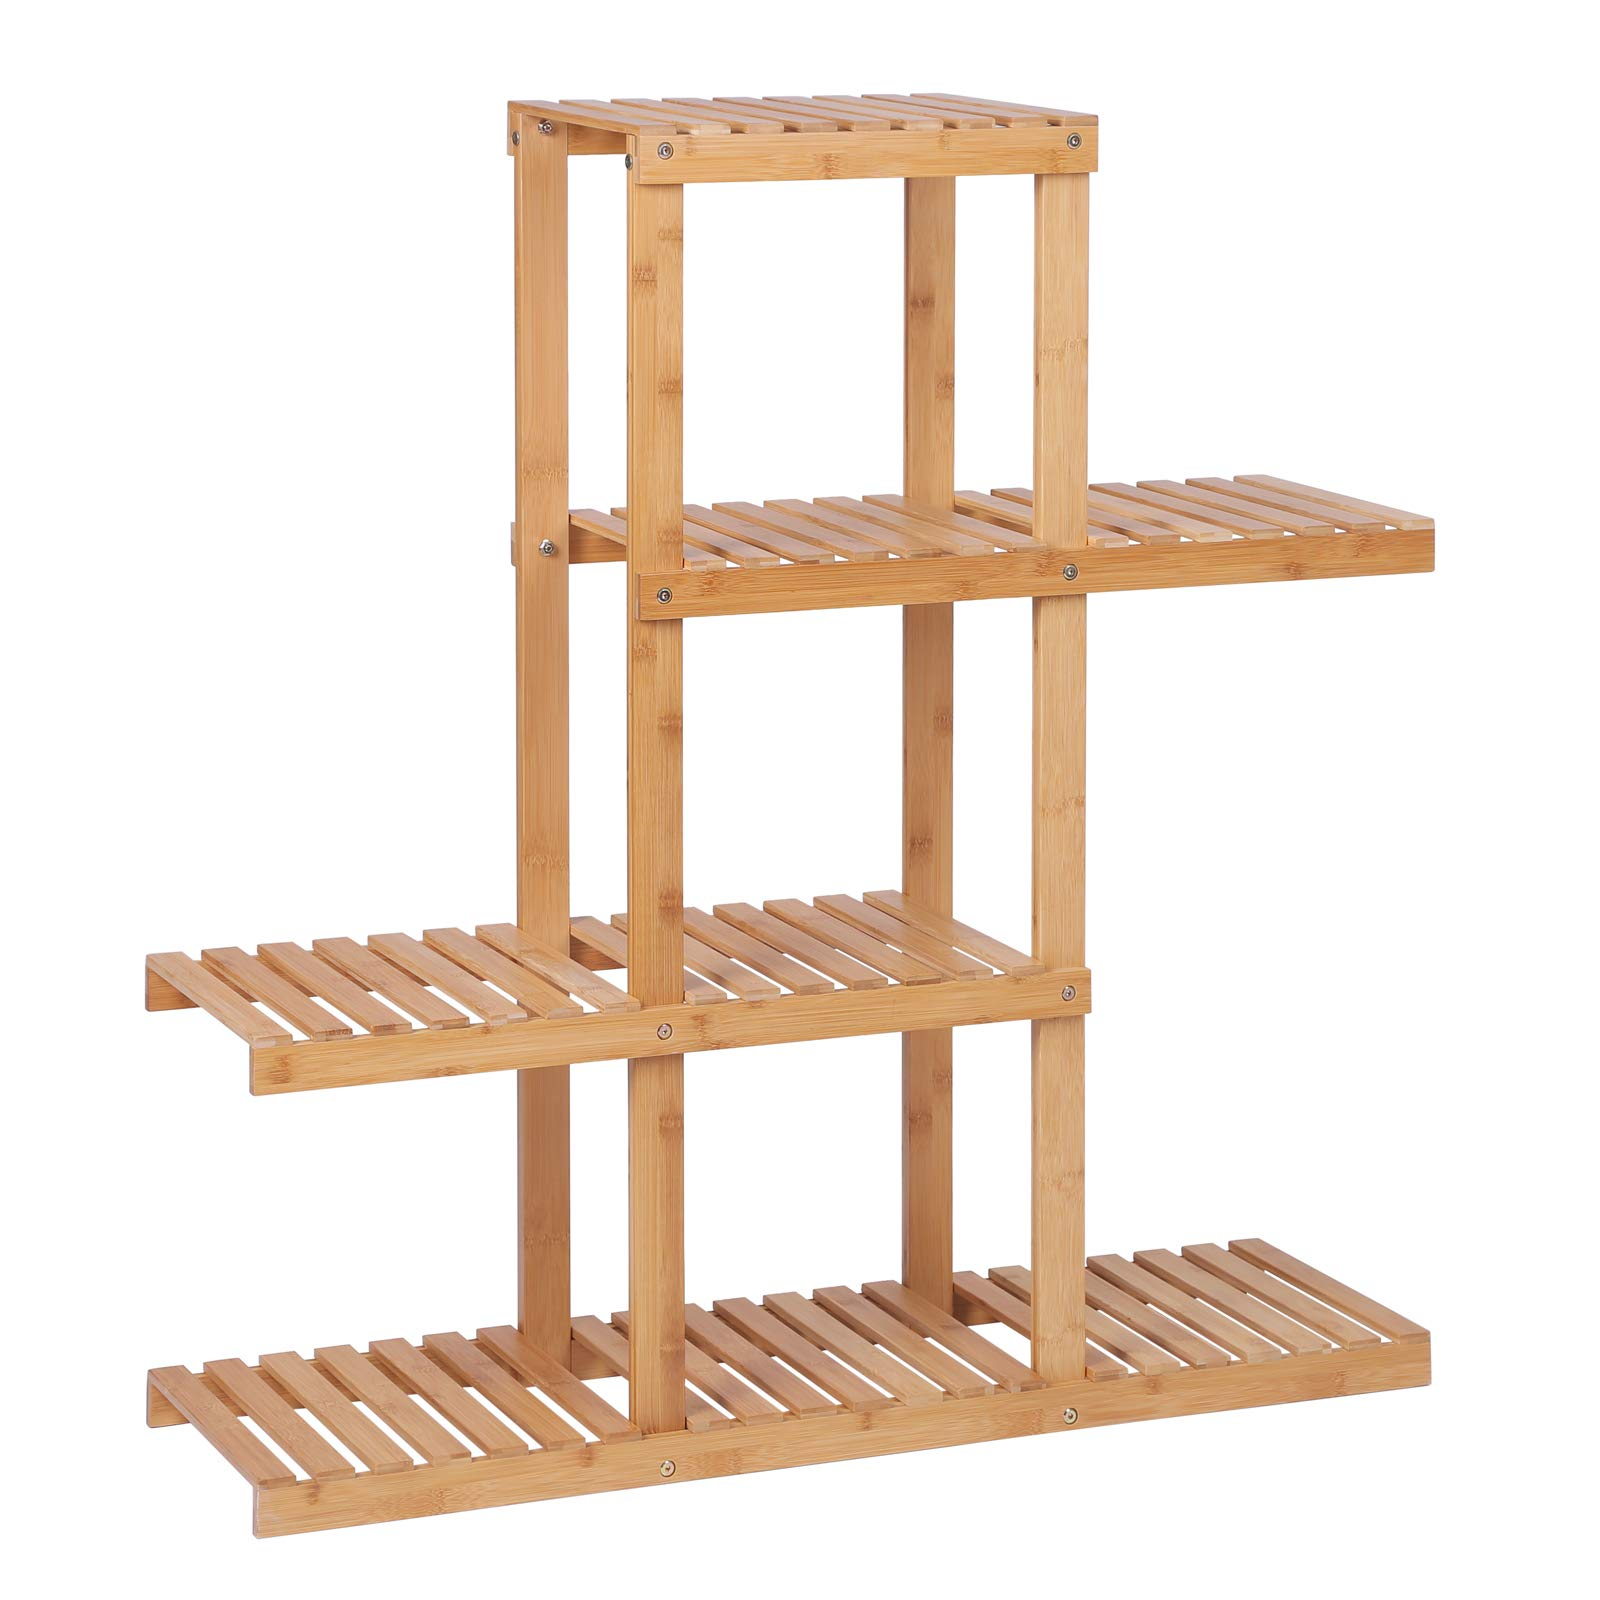 SONGMICS Bamboo Plant Stand Flower Shelf, Utility Shelving Standing Unit, Flower Pots Holder, 4 Tier Display Rack Storage Organizer Rack for Living Room Balcony Hallway Bathroom, Natural by SONGMICS